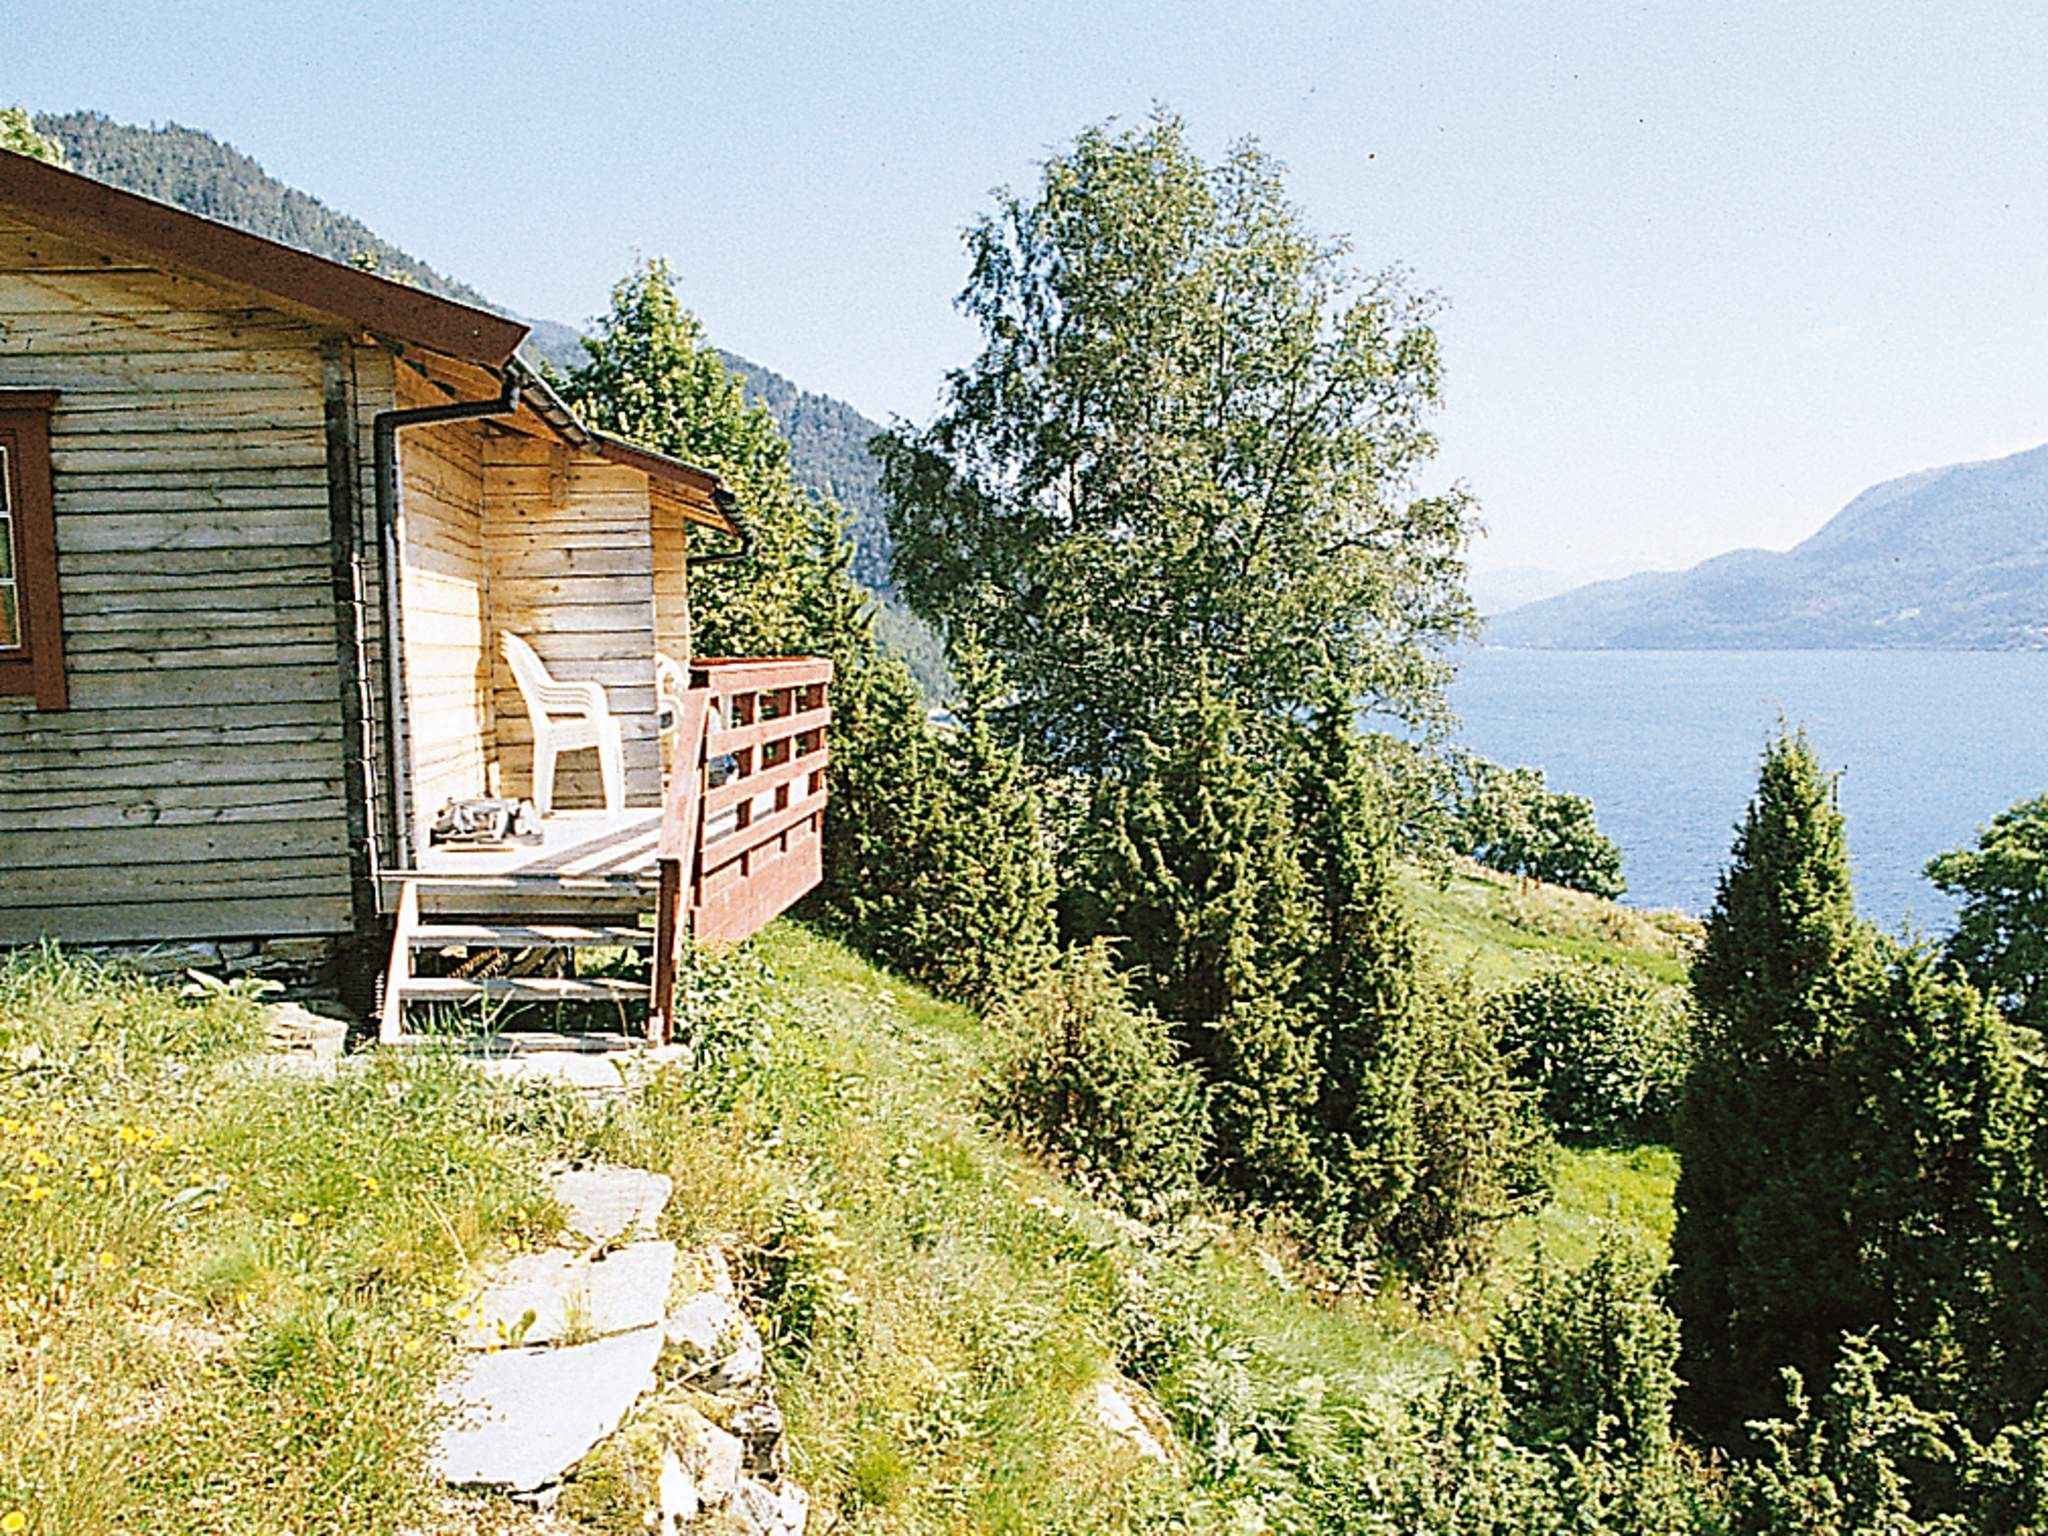 Ferienhaus Heggjabygda (82601), Nordfjordeid, Sognefjord - Nordfjord, Westnorwegen, Norwegen, Bild 4